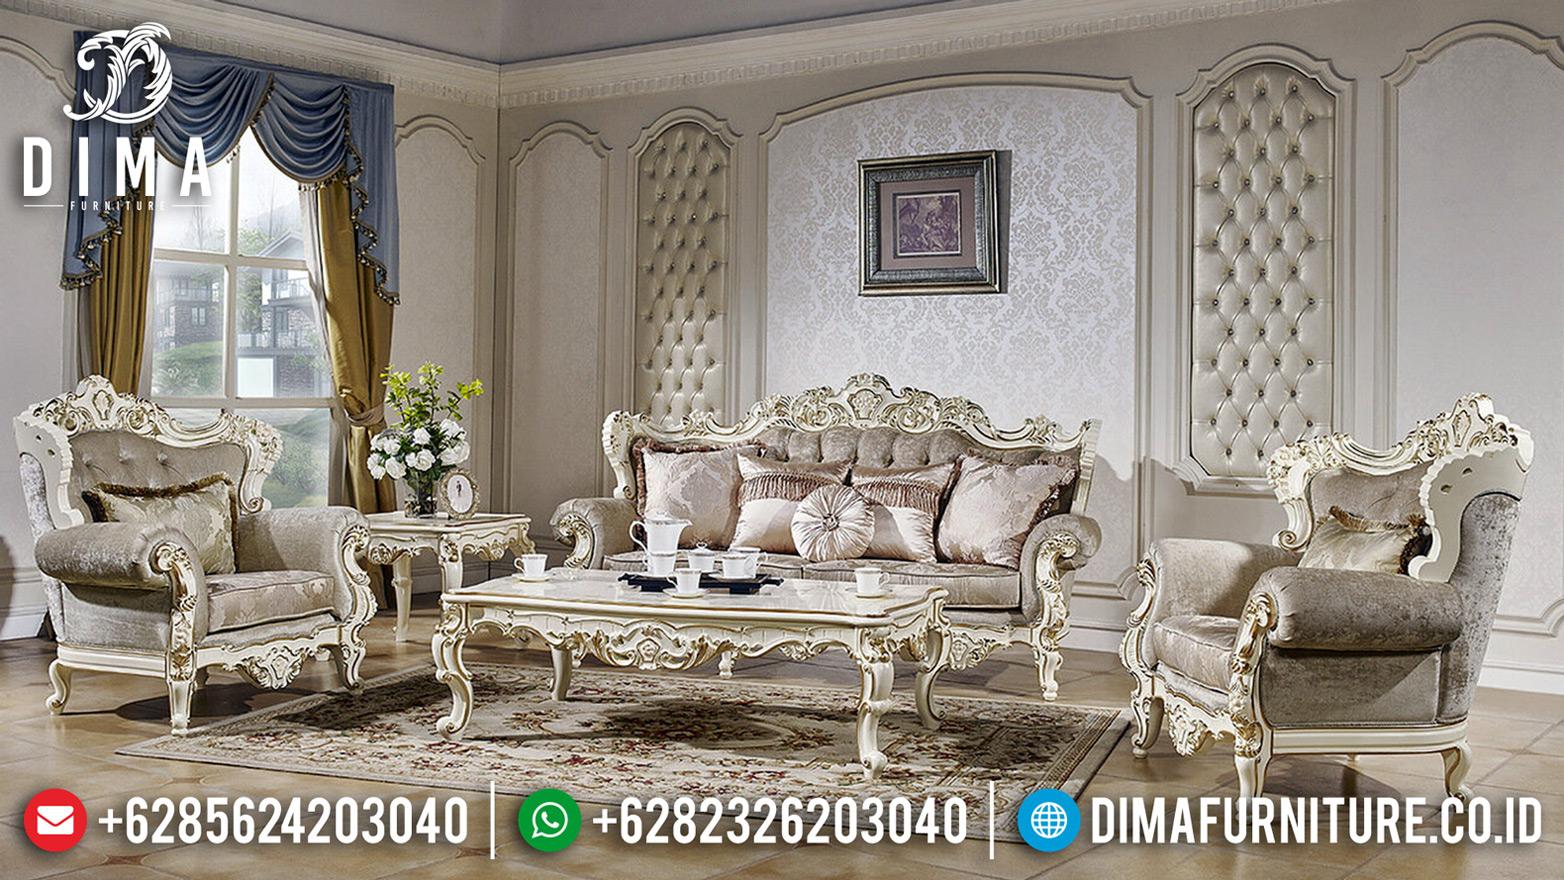 Design Interior Sofa Tamu Mewah Jepara Luxurian New Style Furniture Terbaru BT-0654